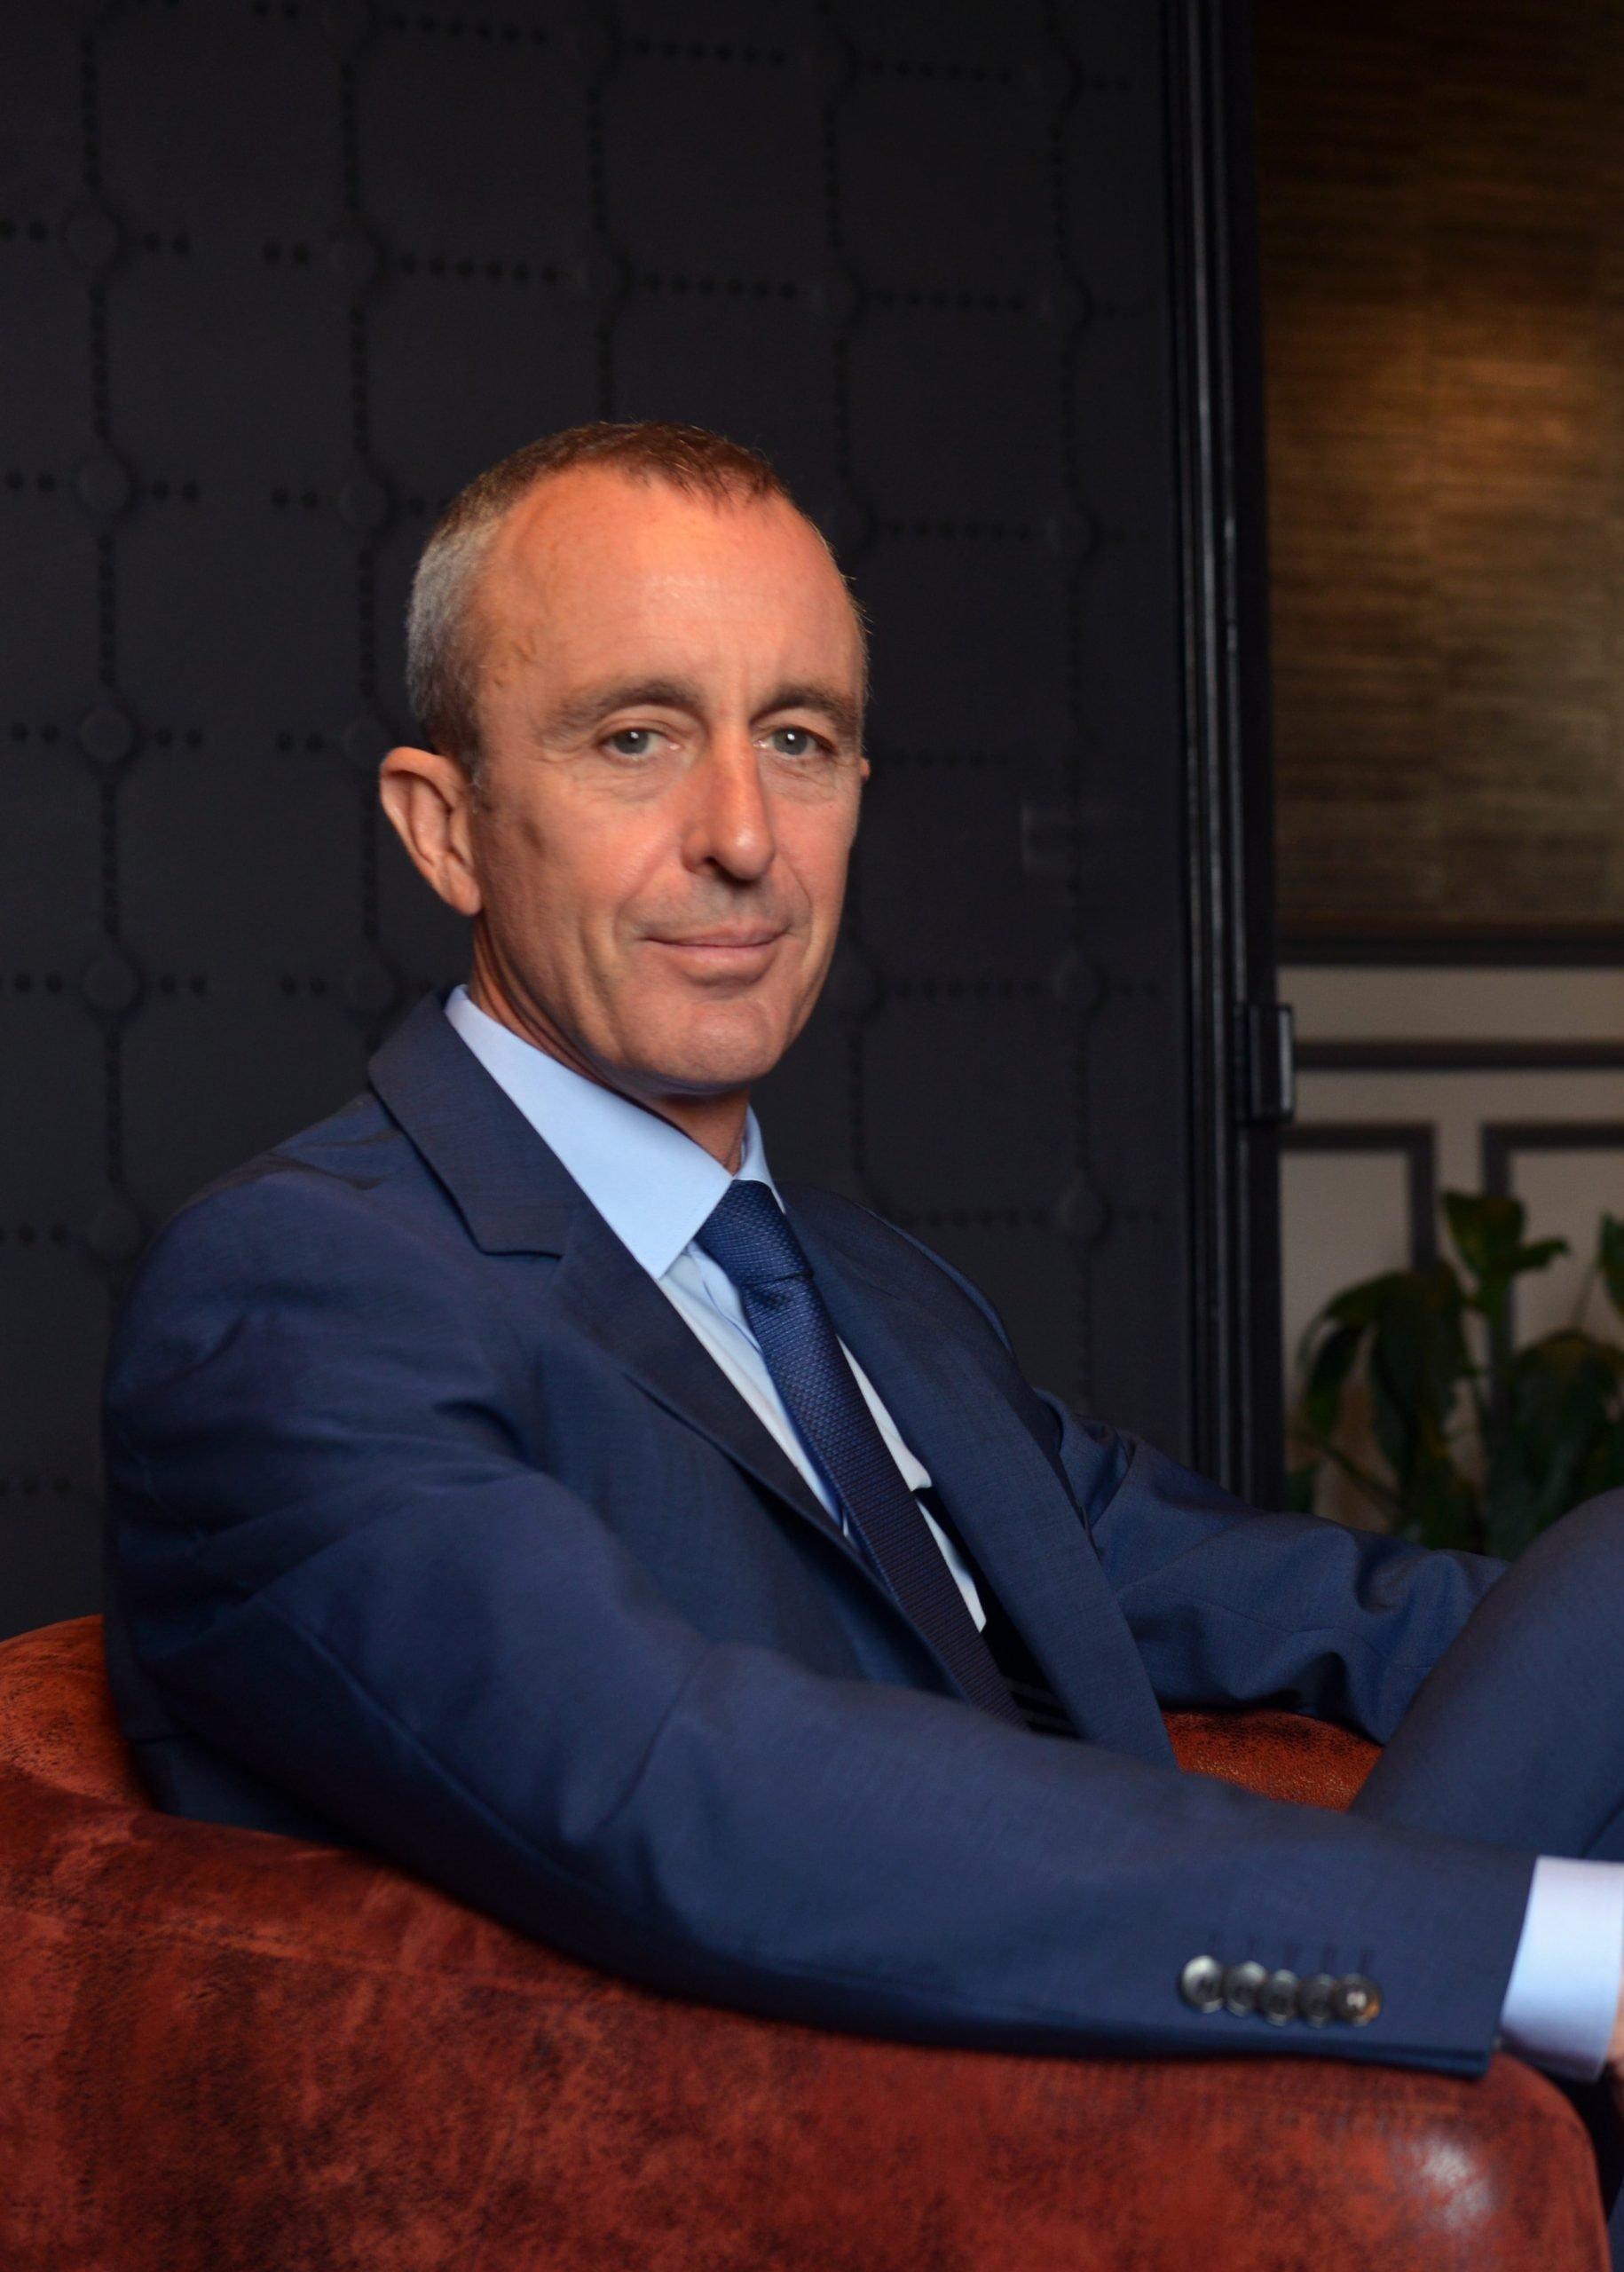 Xavier Delafosse